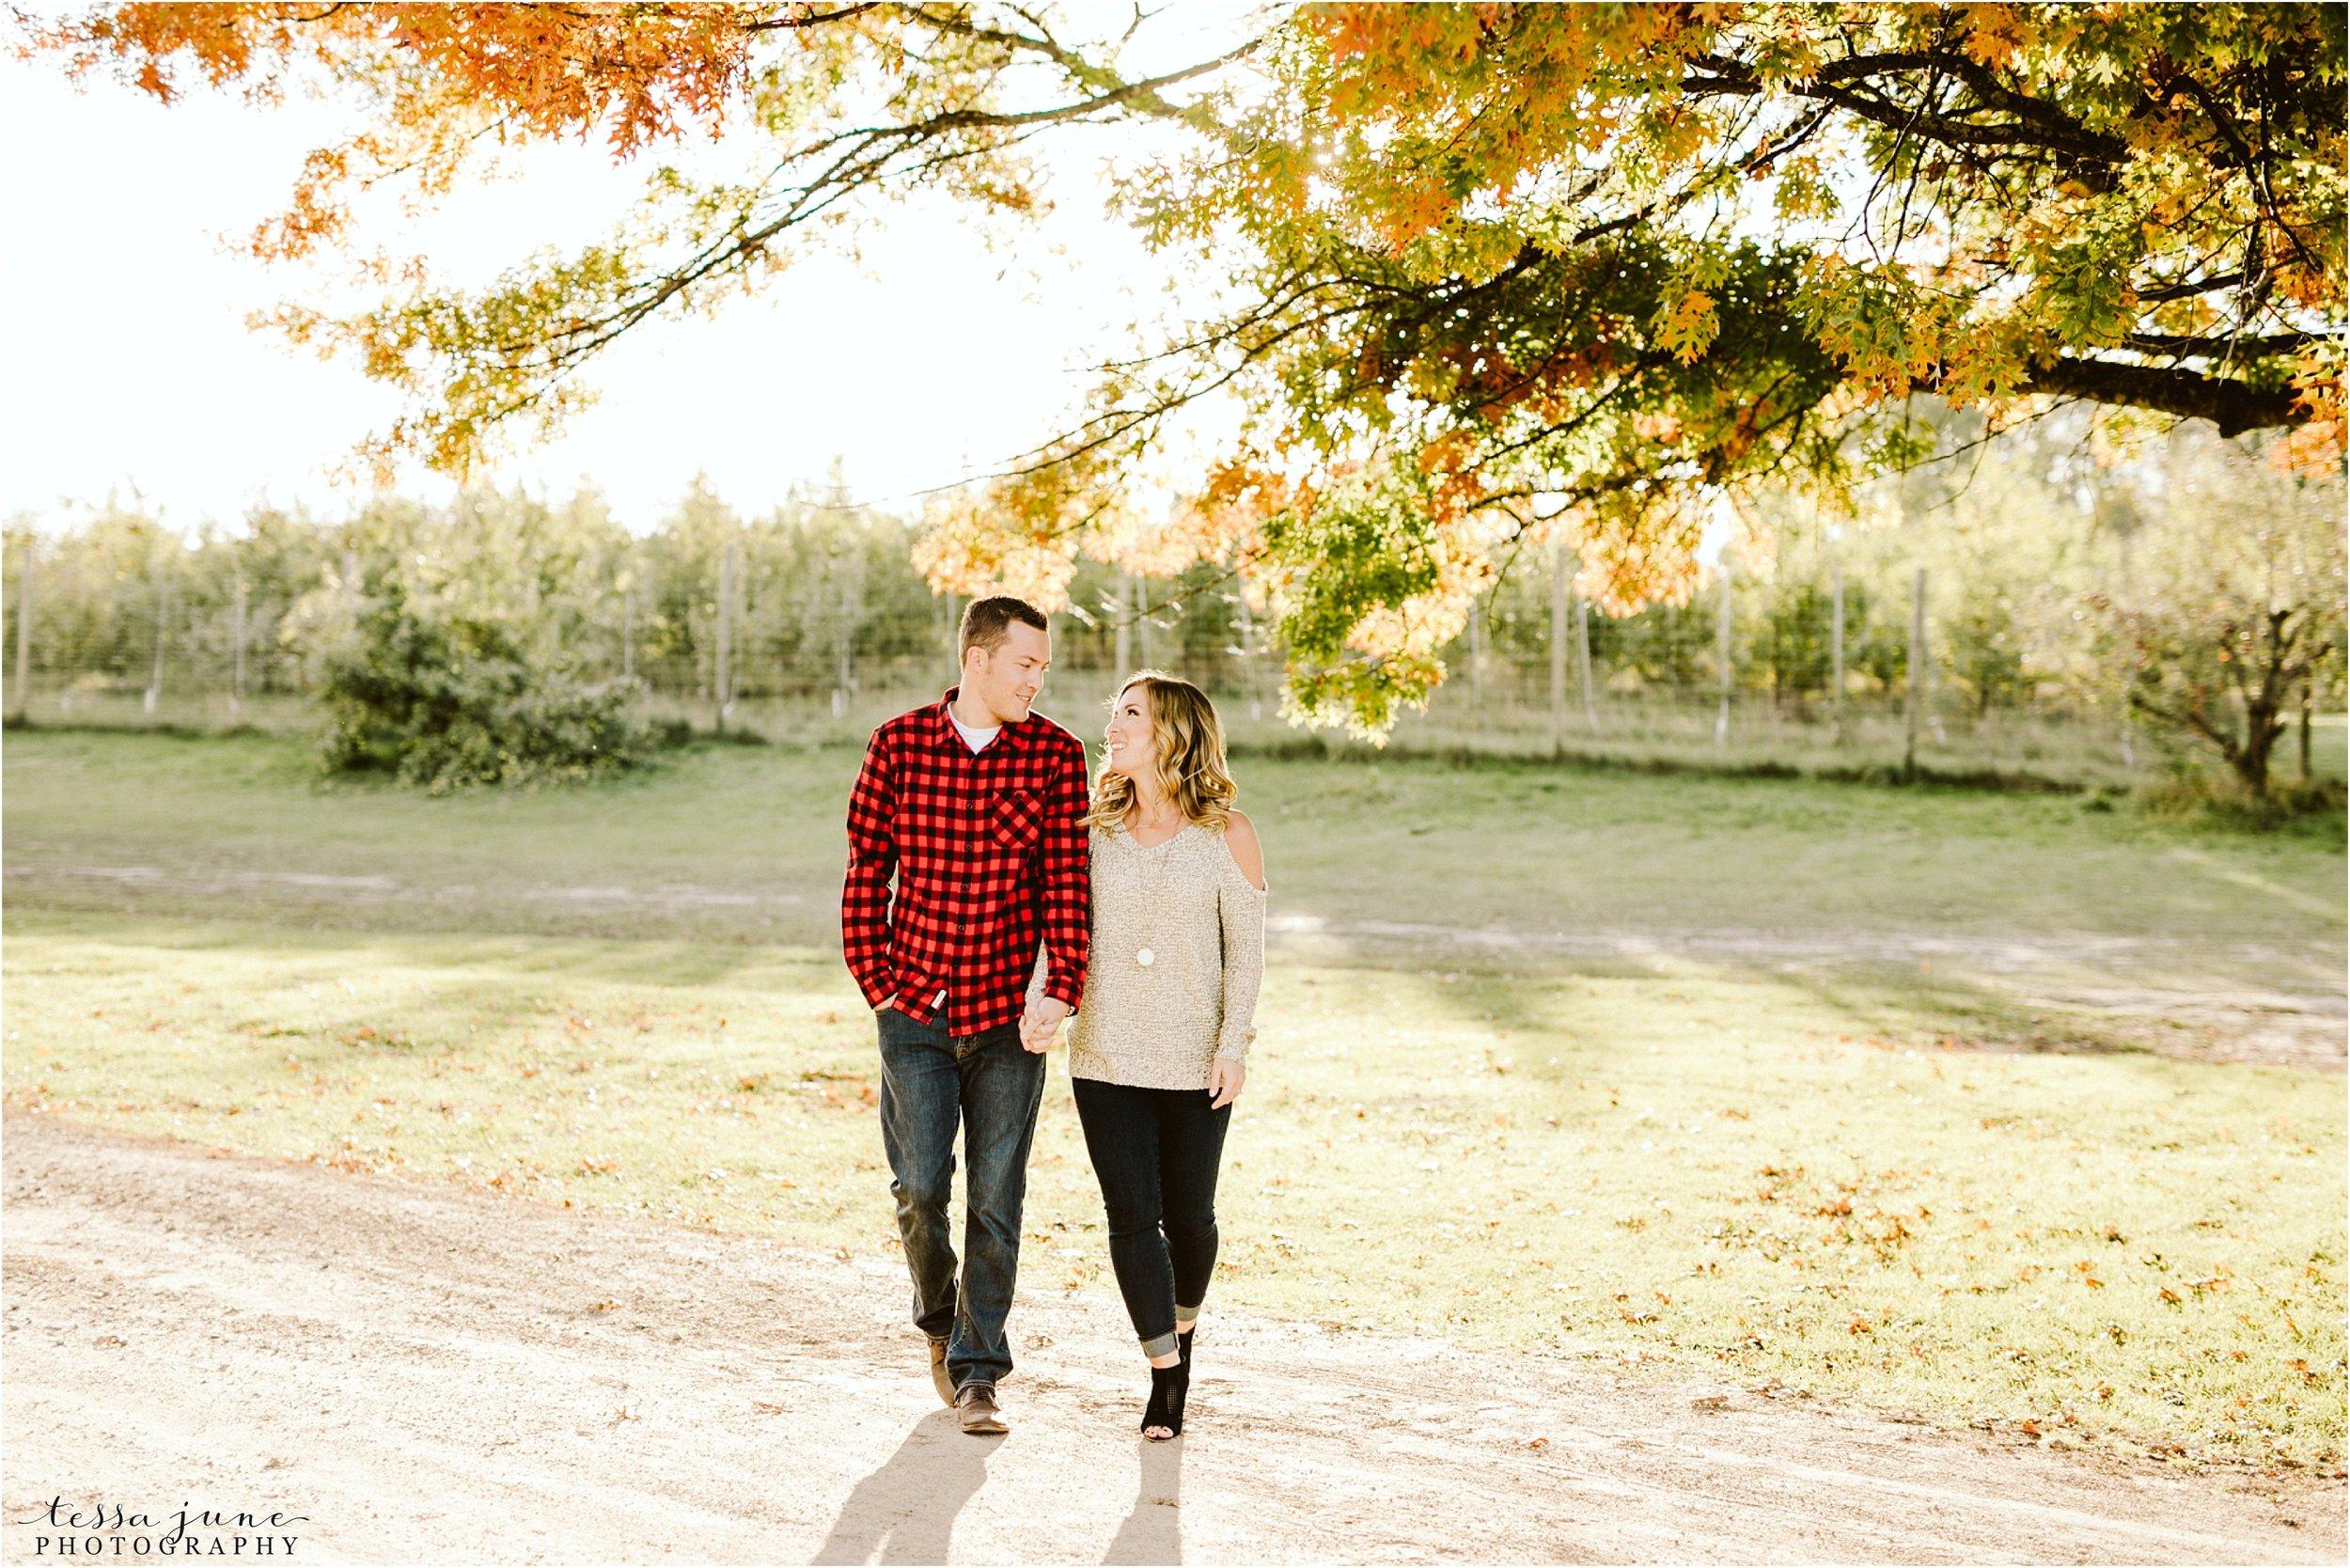 st-cloud-wedding-photographer-deer-lake-orchard-engagement-21.jpg